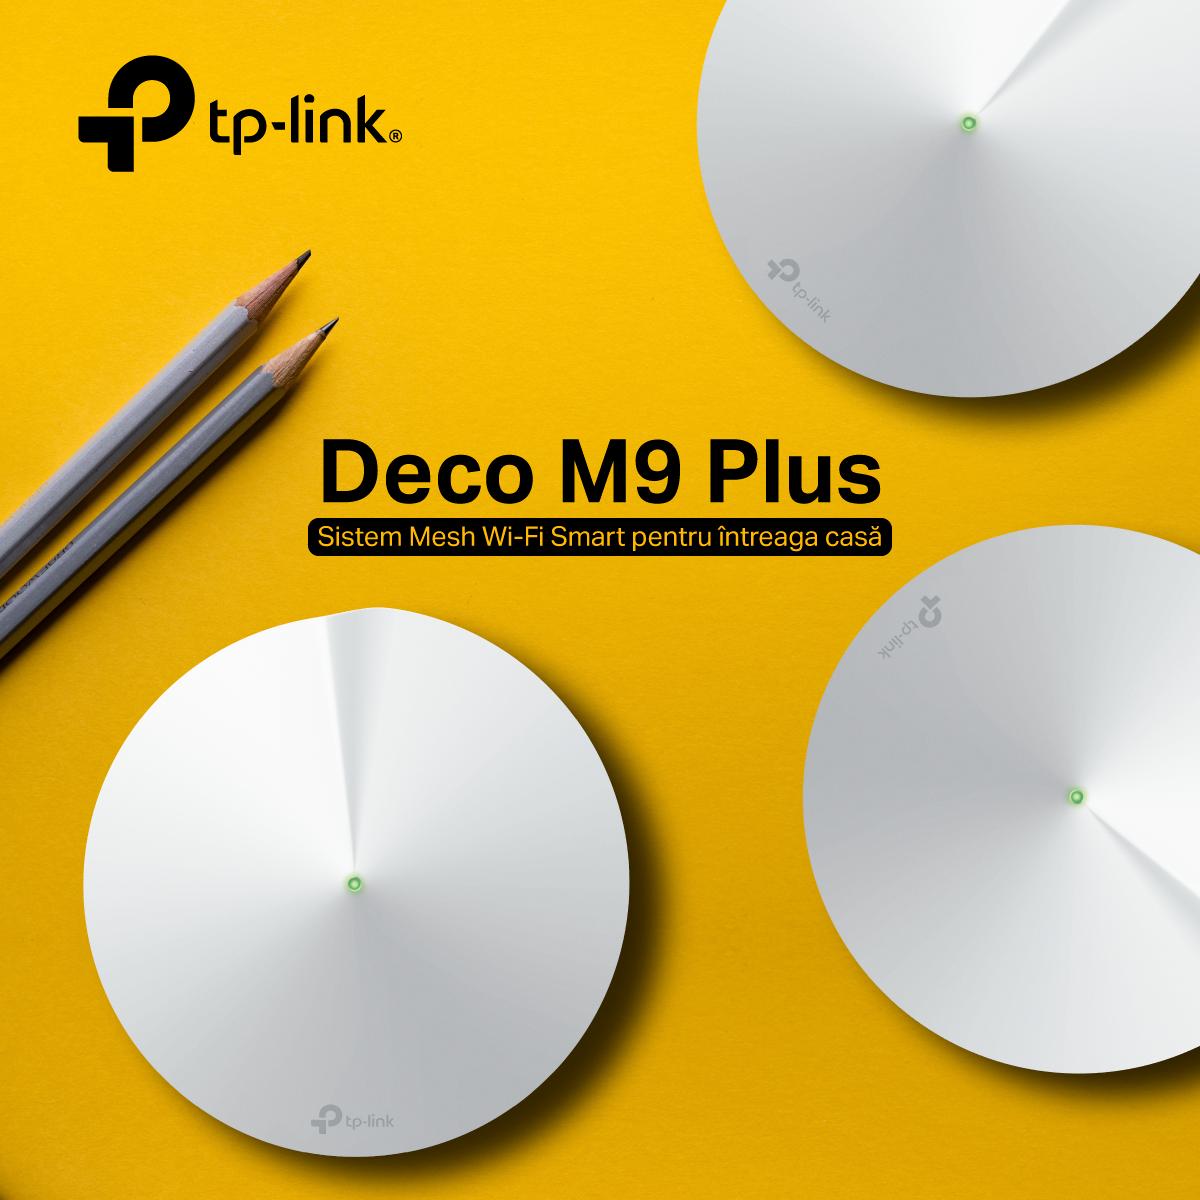 Review TP-Link Deco M9 Plus: Mesh Wi-Fi prieten cu casele inteligente!